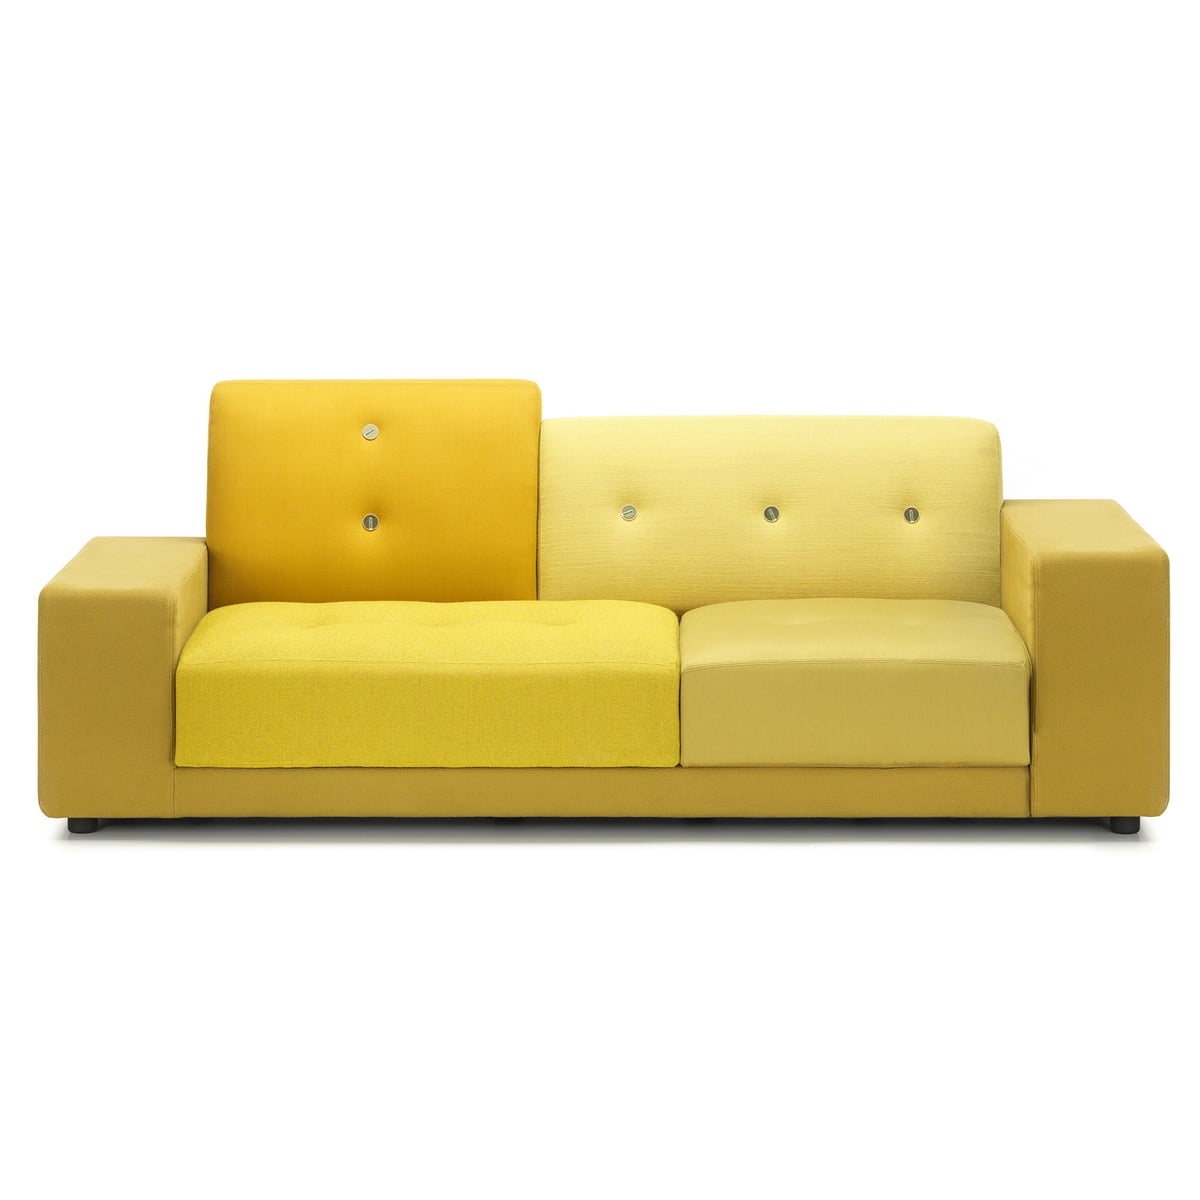 polder compact sofa von vitra connox. Black Bedroom Furniture Sets. Home Design Ideas